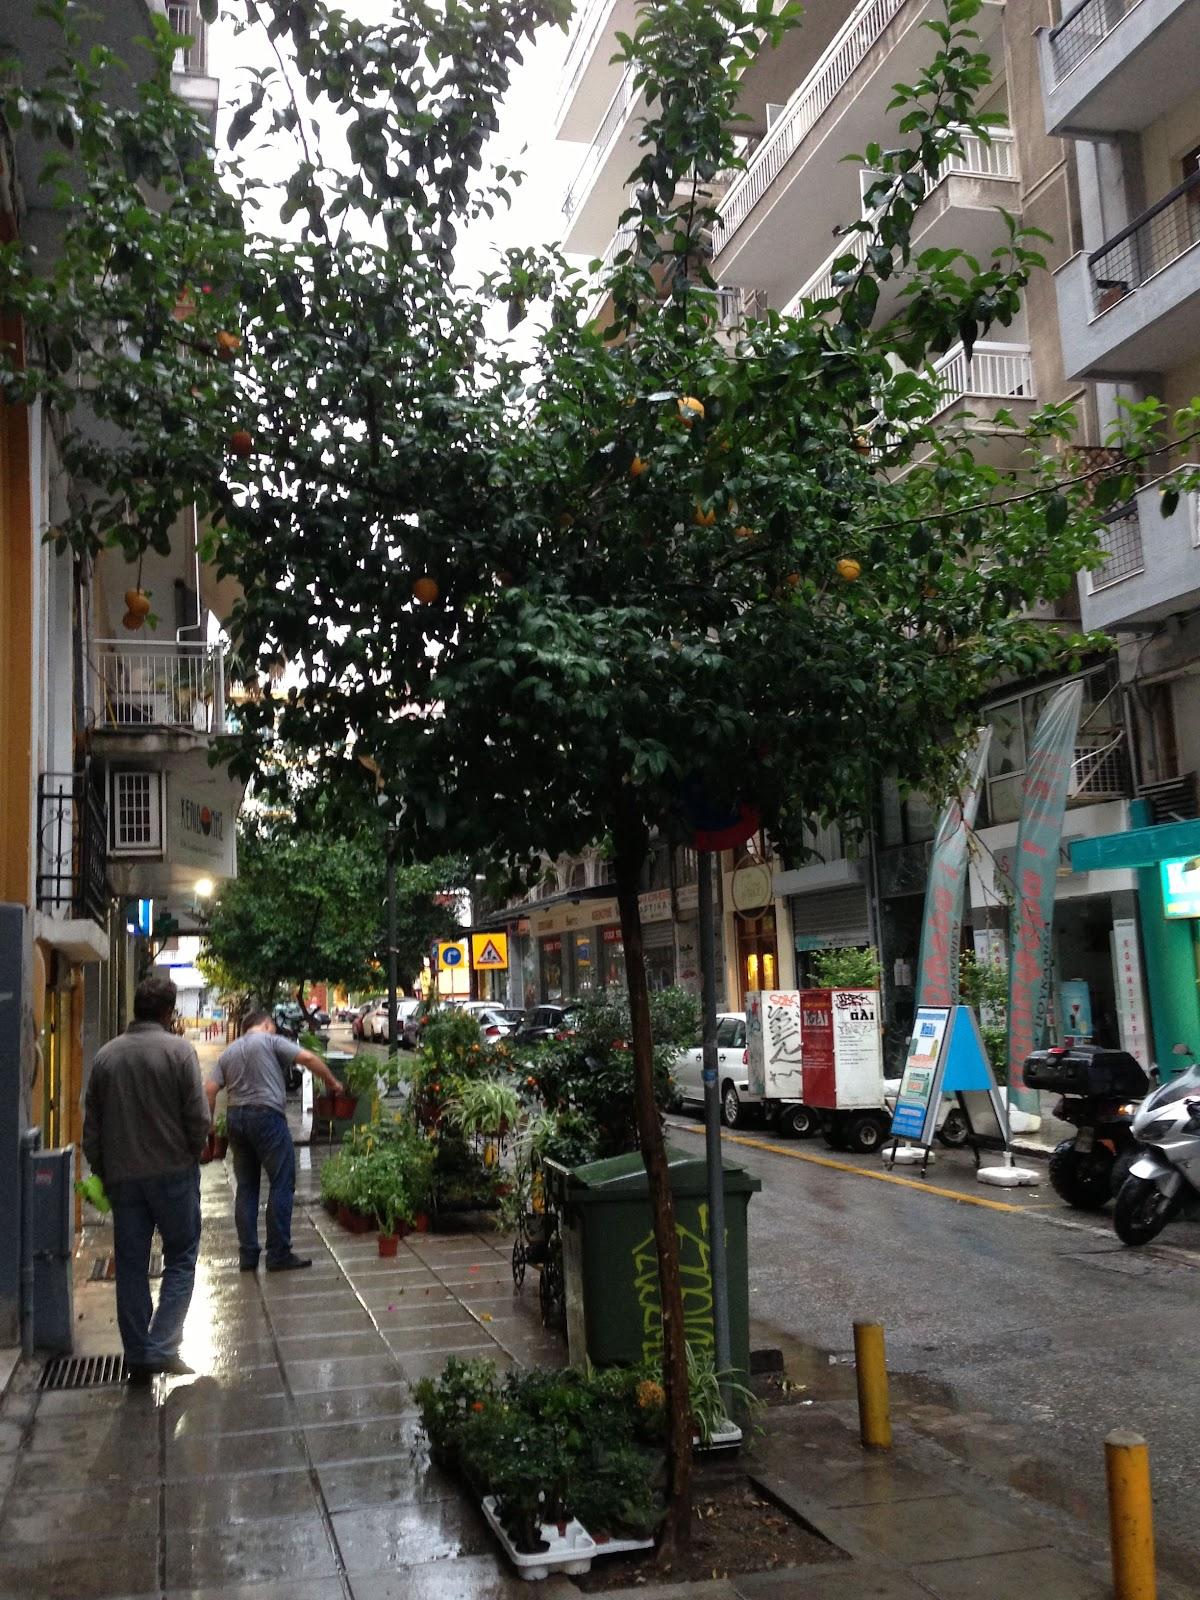 Day 19 - 2013-06-12 - Thessaloniki - IMG_1212.JPG